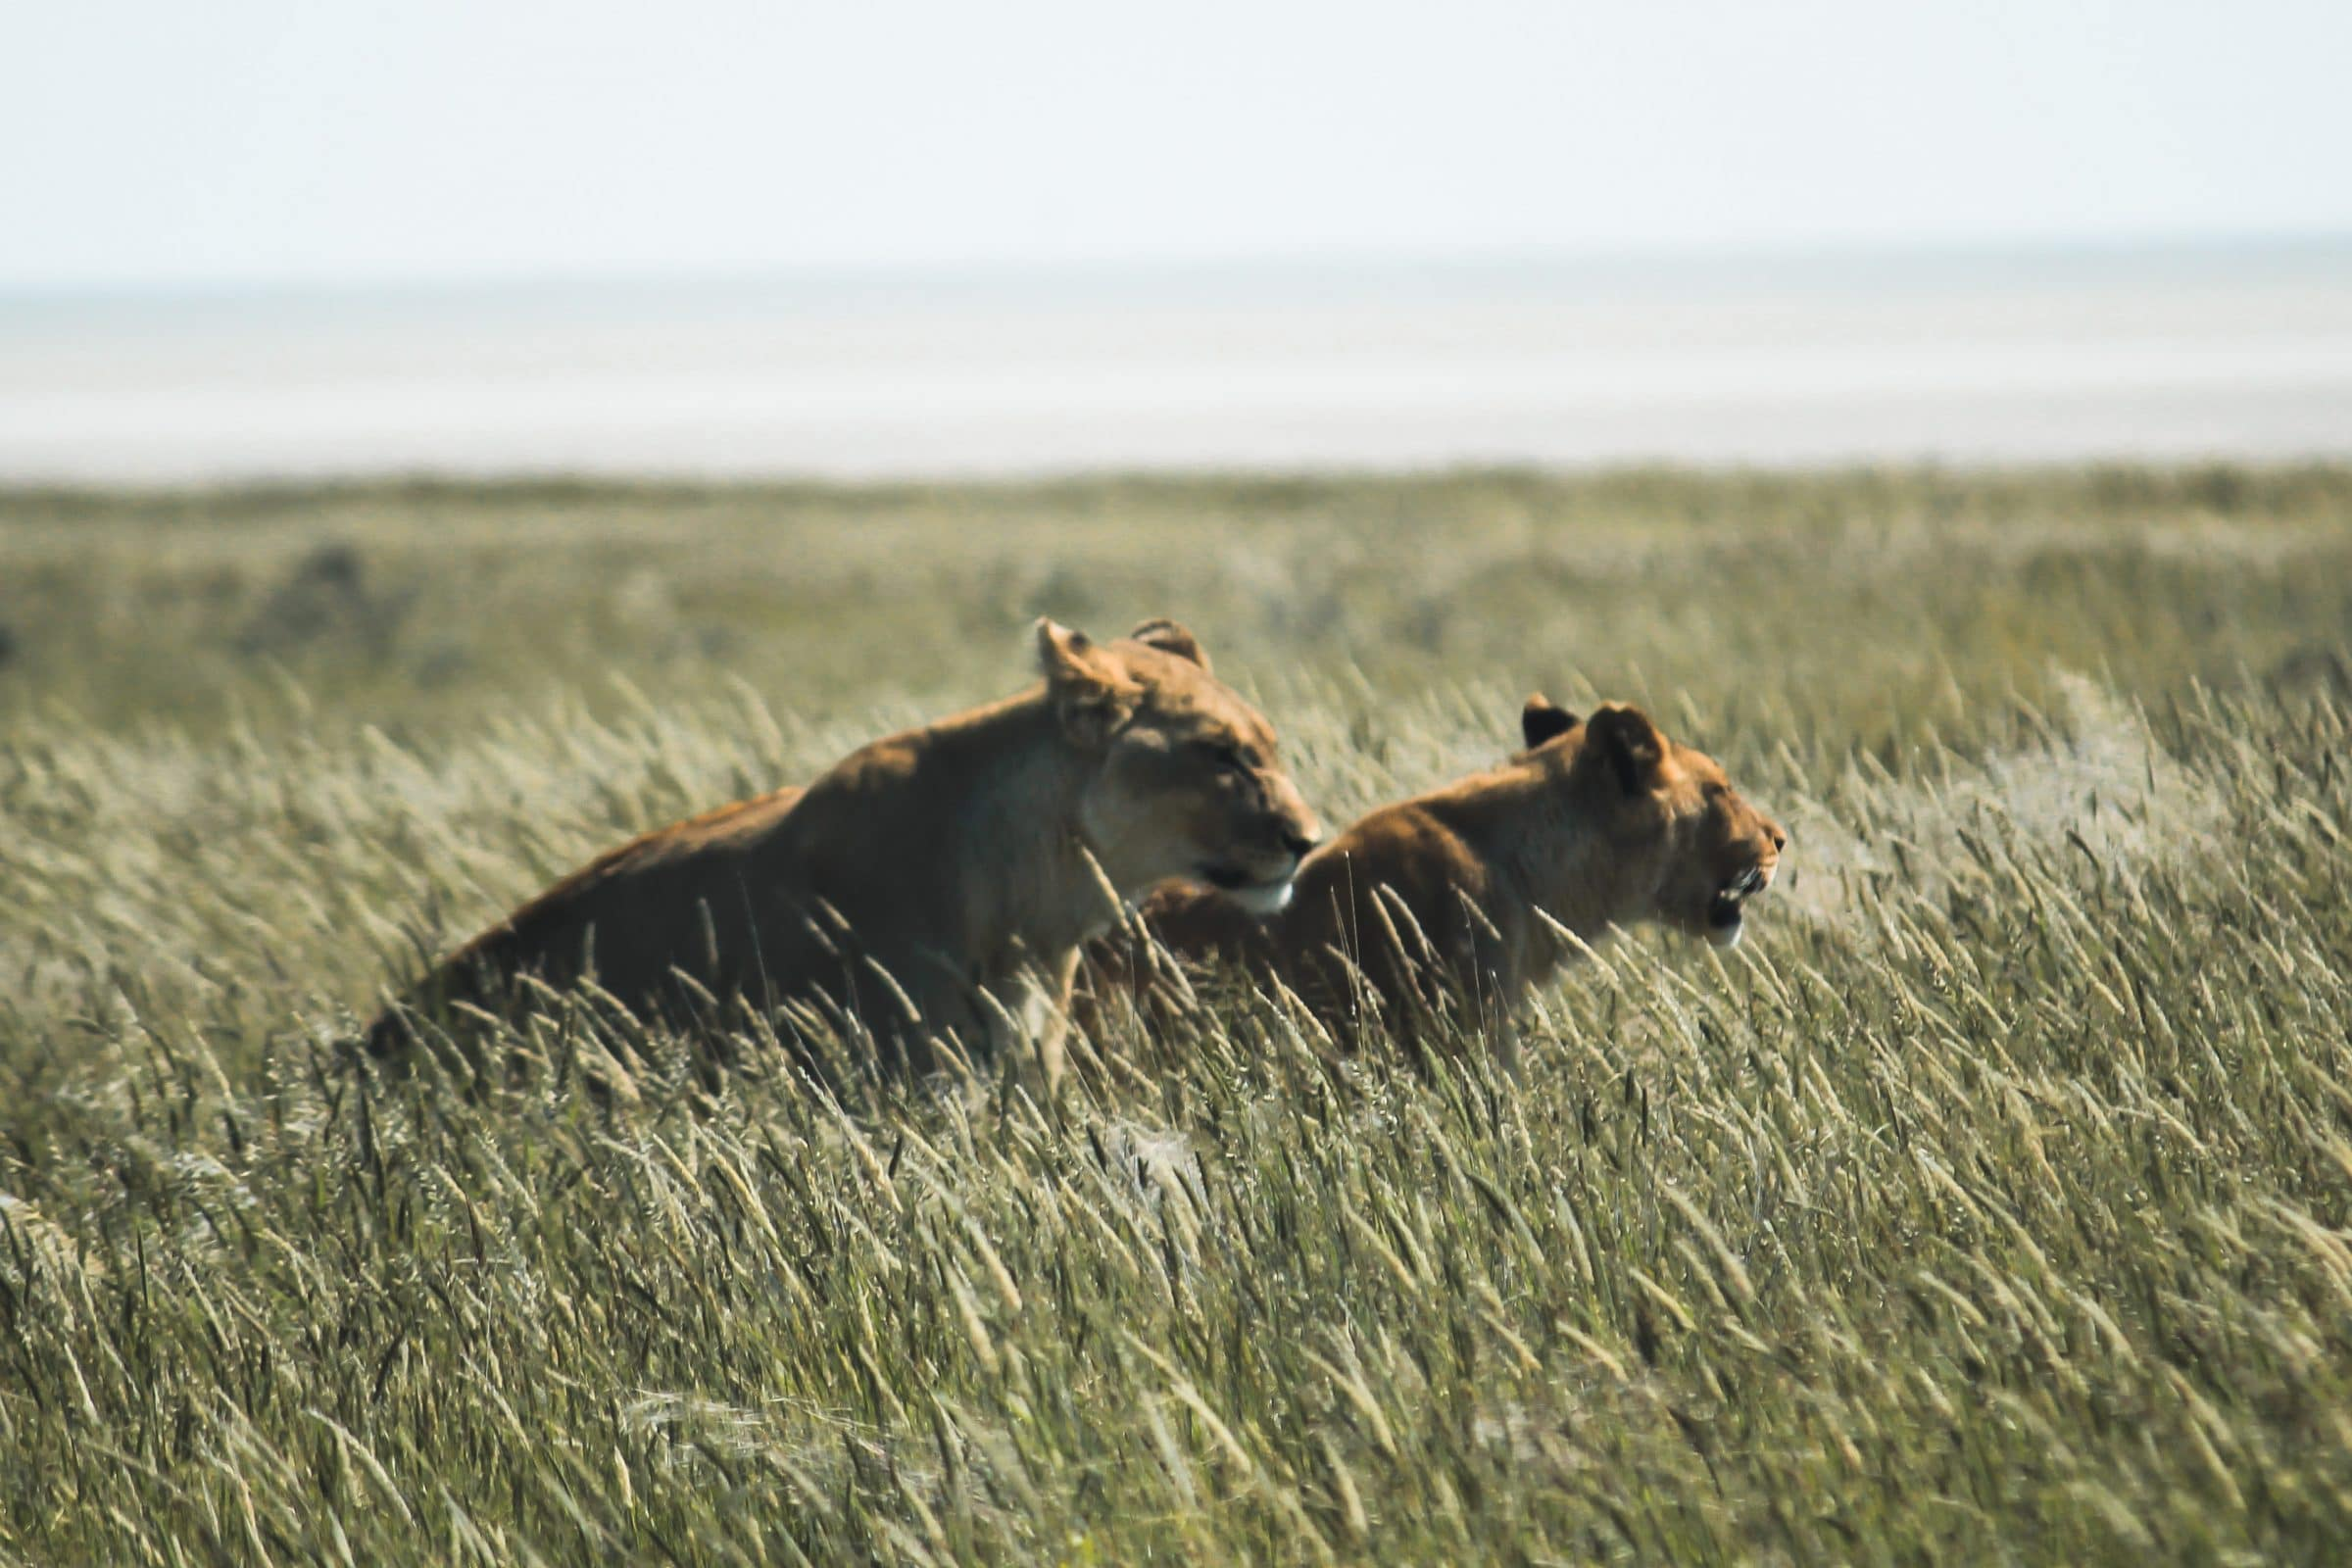 Twee leeuwen op jacht in Etosha National Park